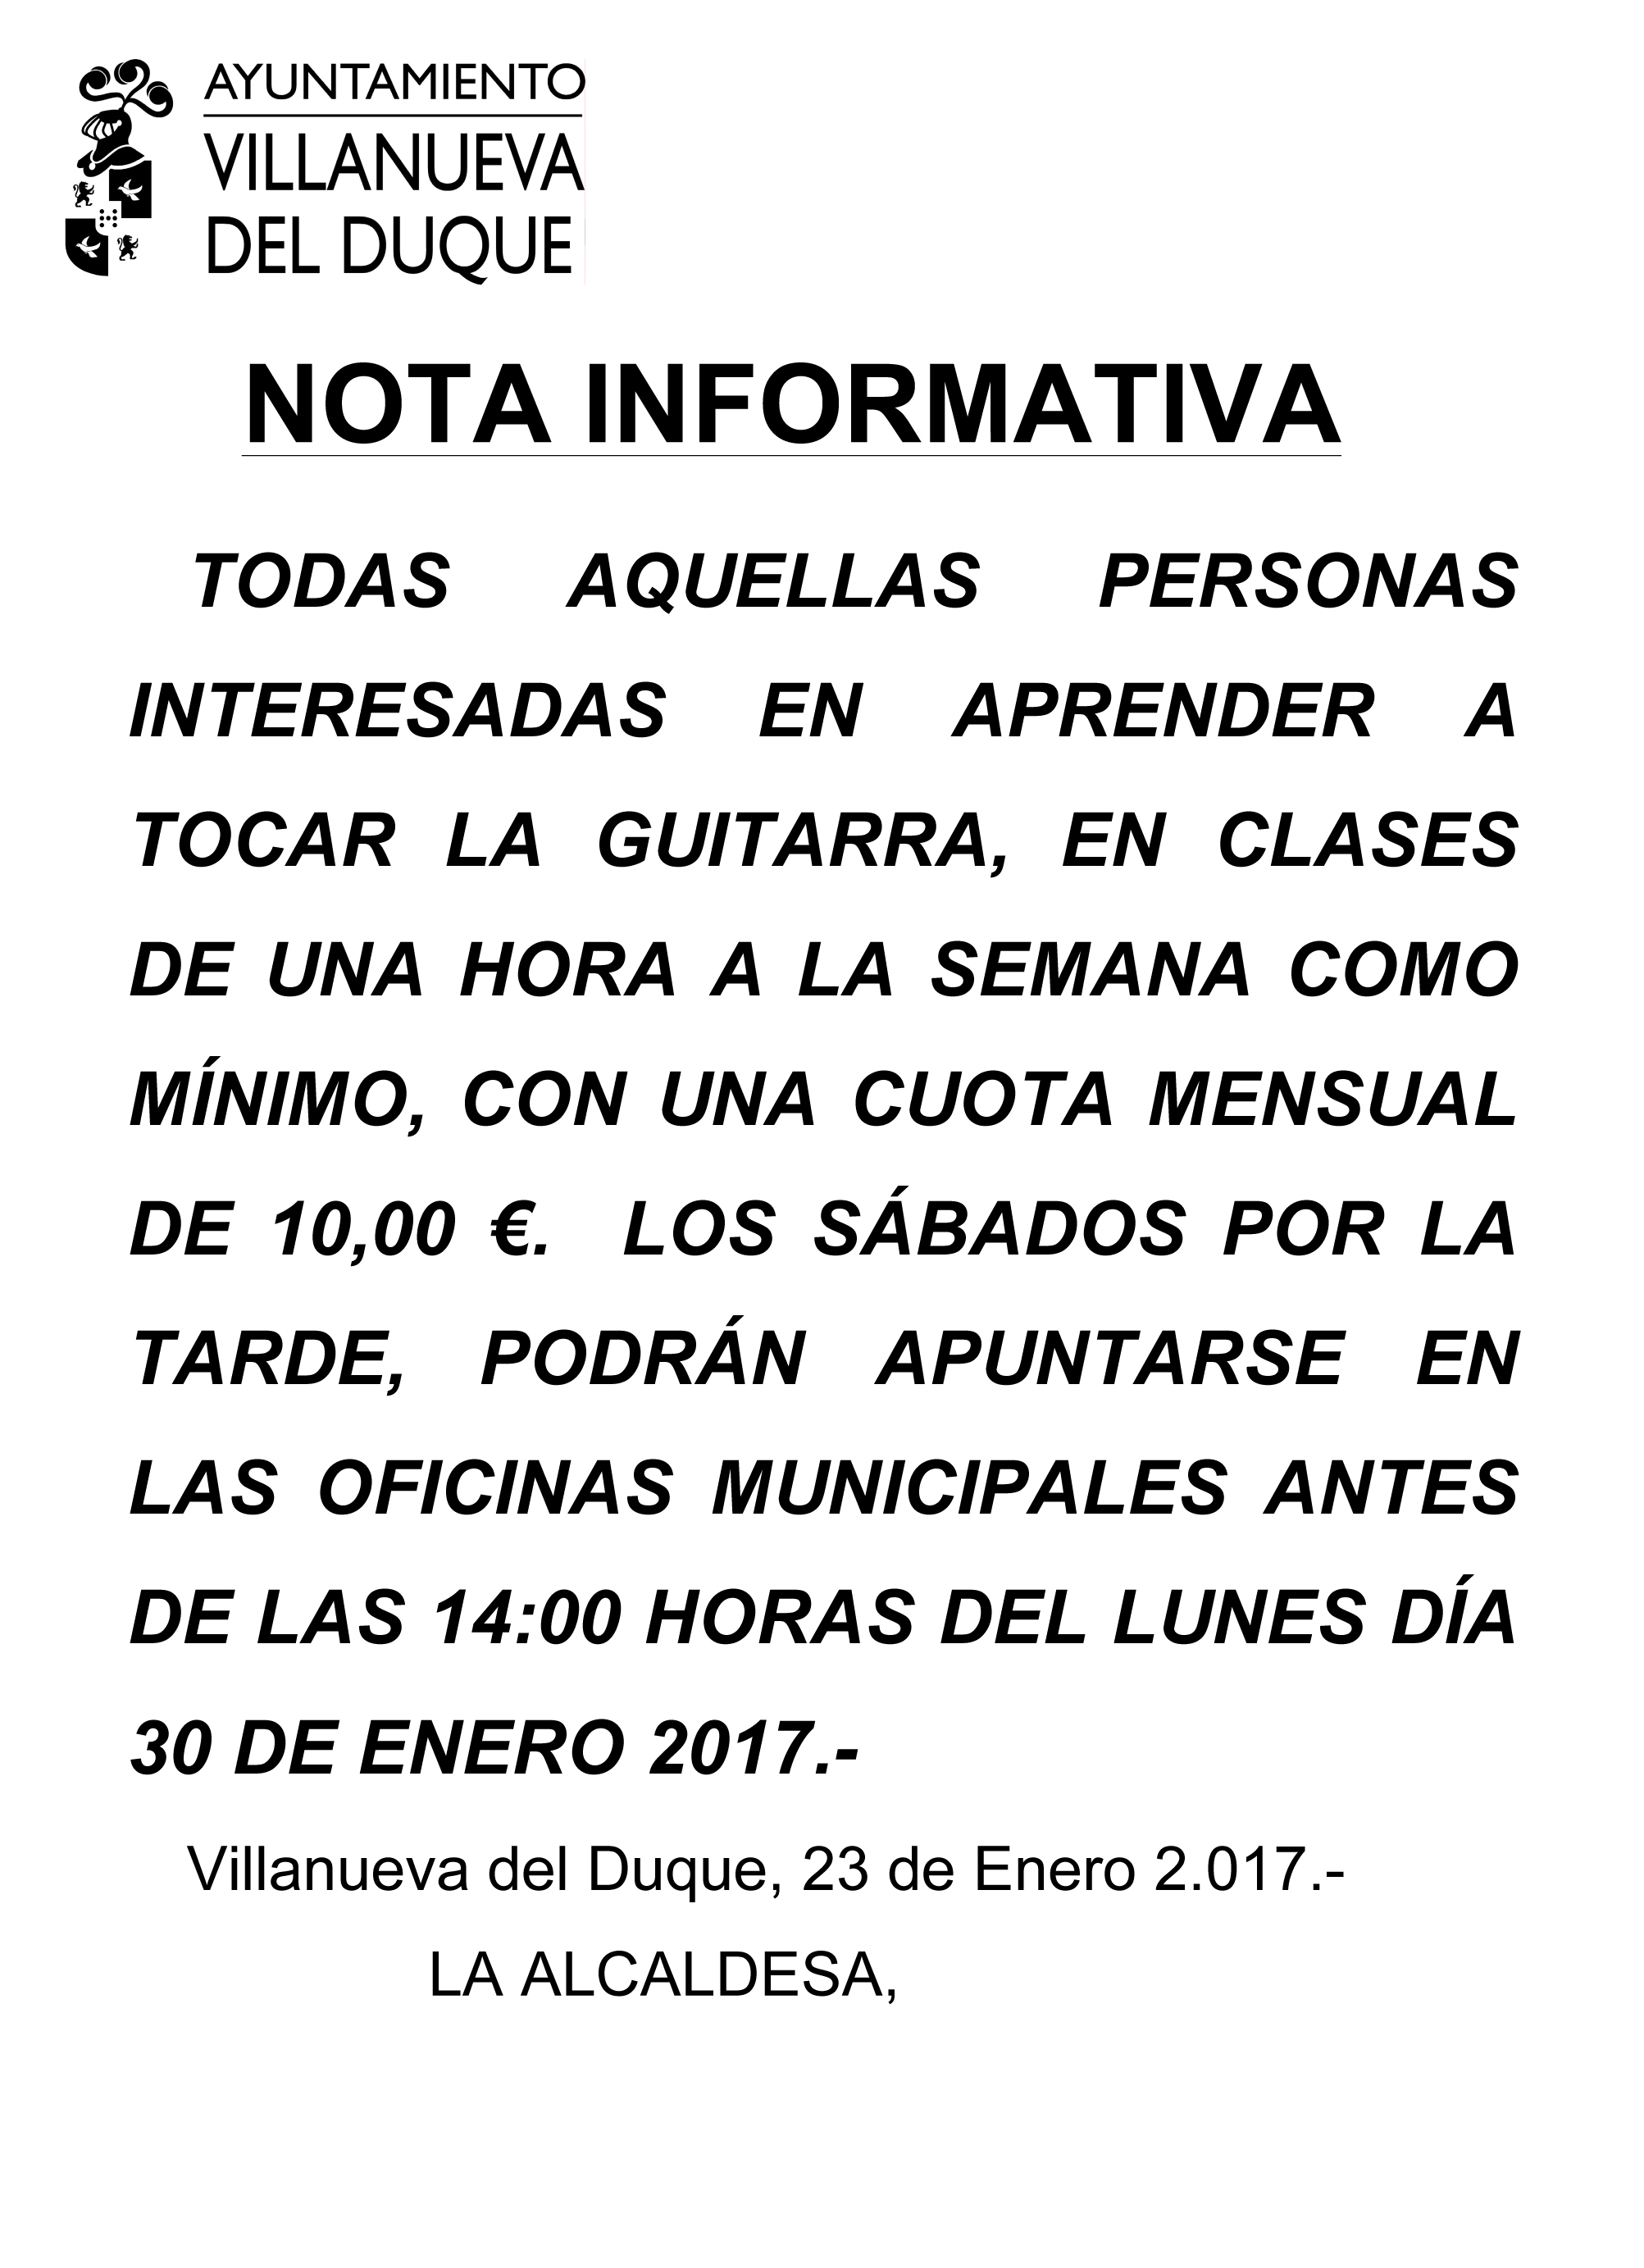 Microsoft Word - nota informativa guitarra.doc